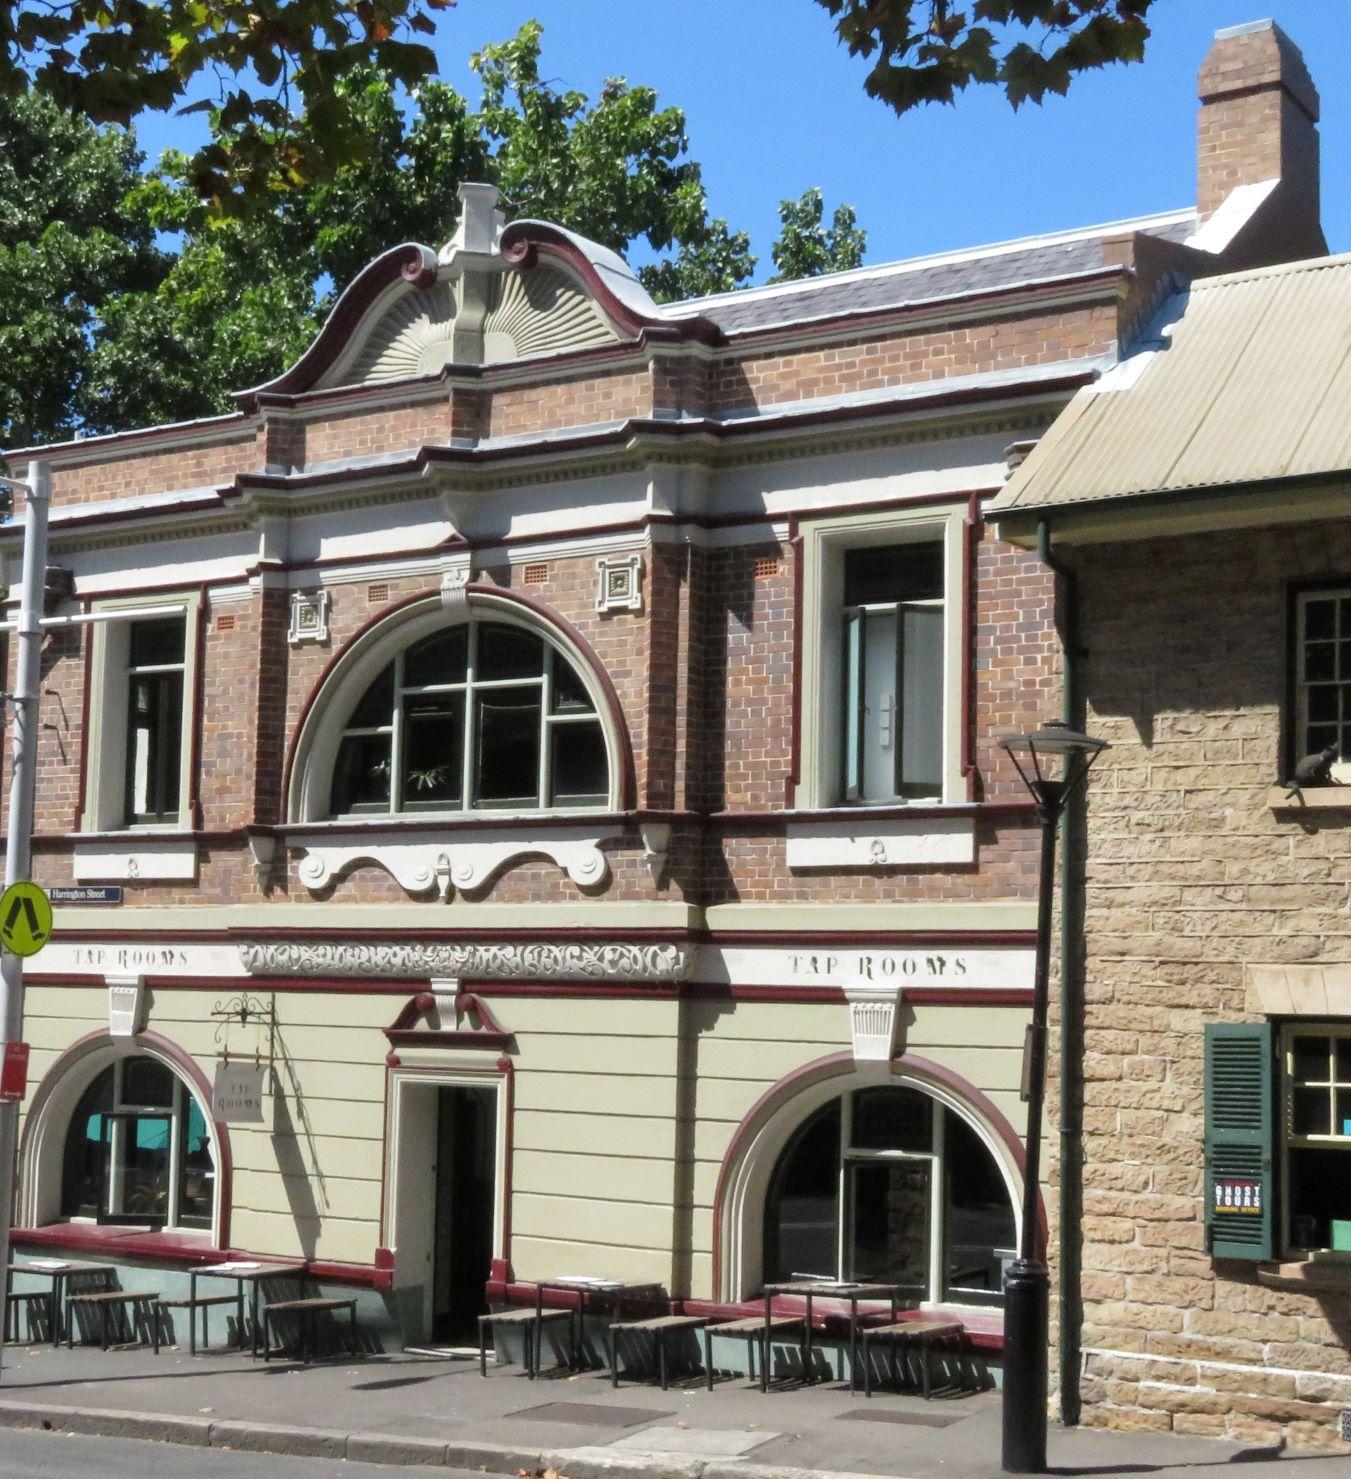 Sydney Architecture Llywindatravels 2019